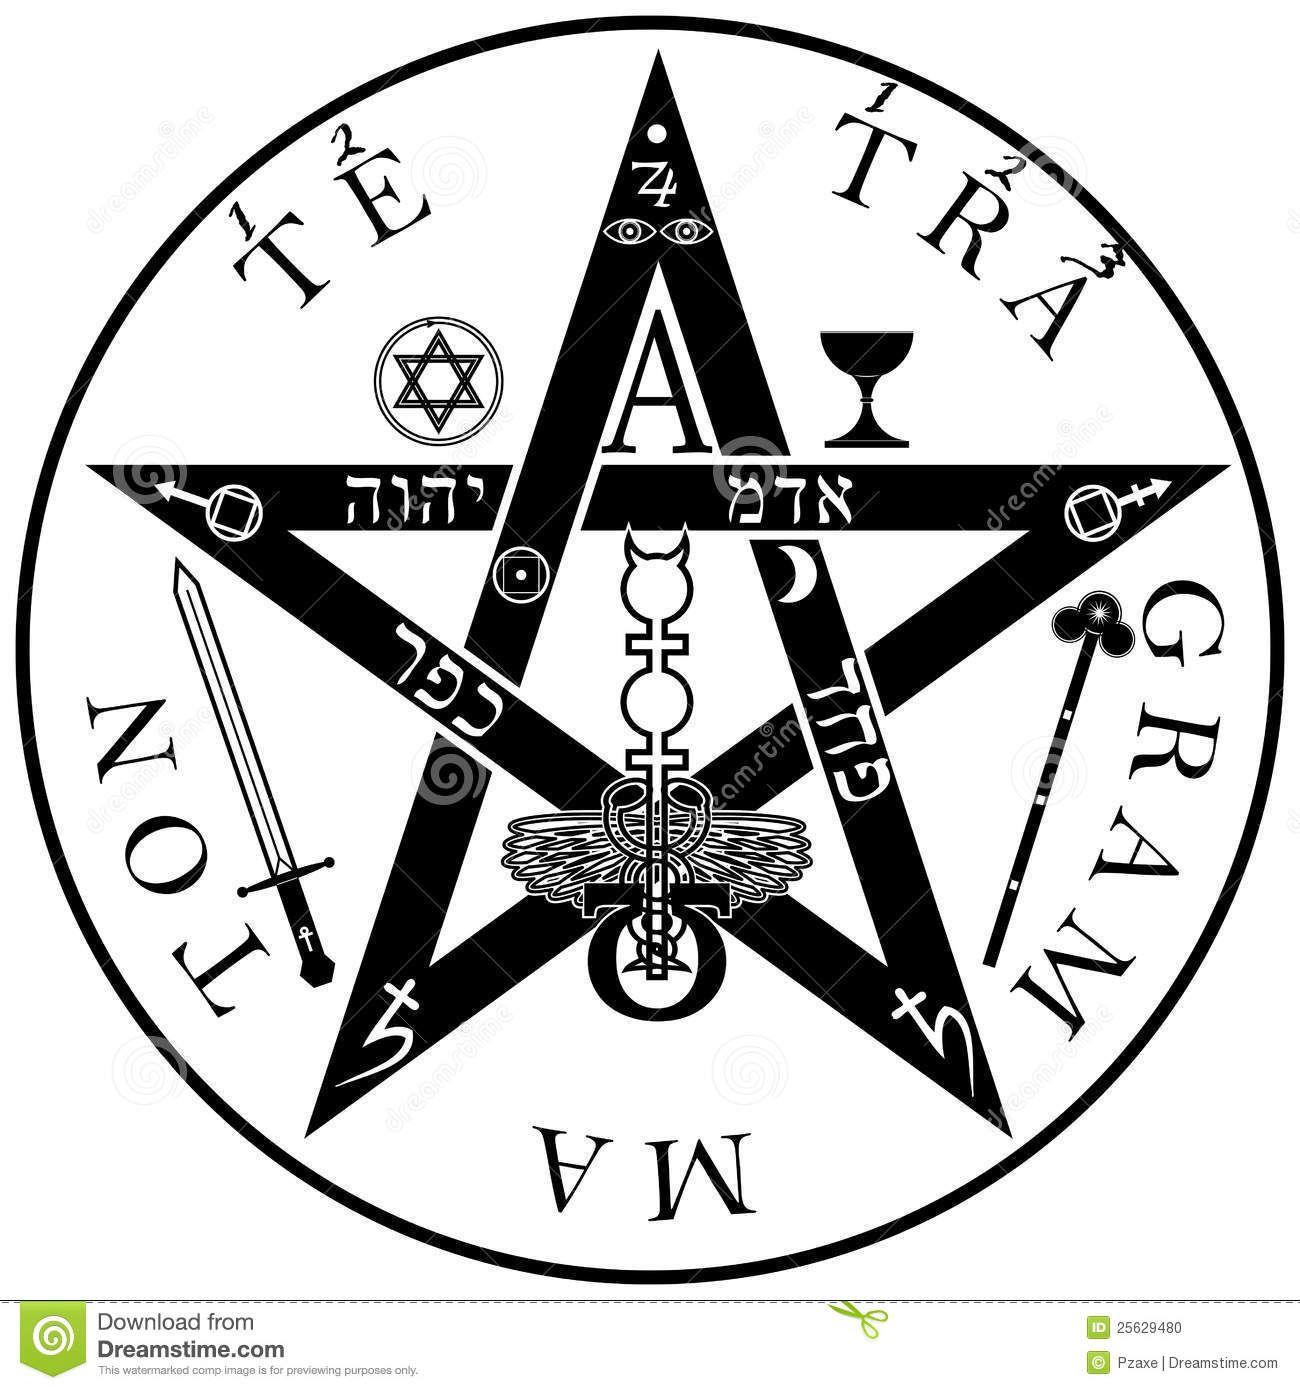 Imagen relacionada alchemic pinterest searching the ancient symbol tetragrammaton ineffable name of god stock photo biocorpaavc